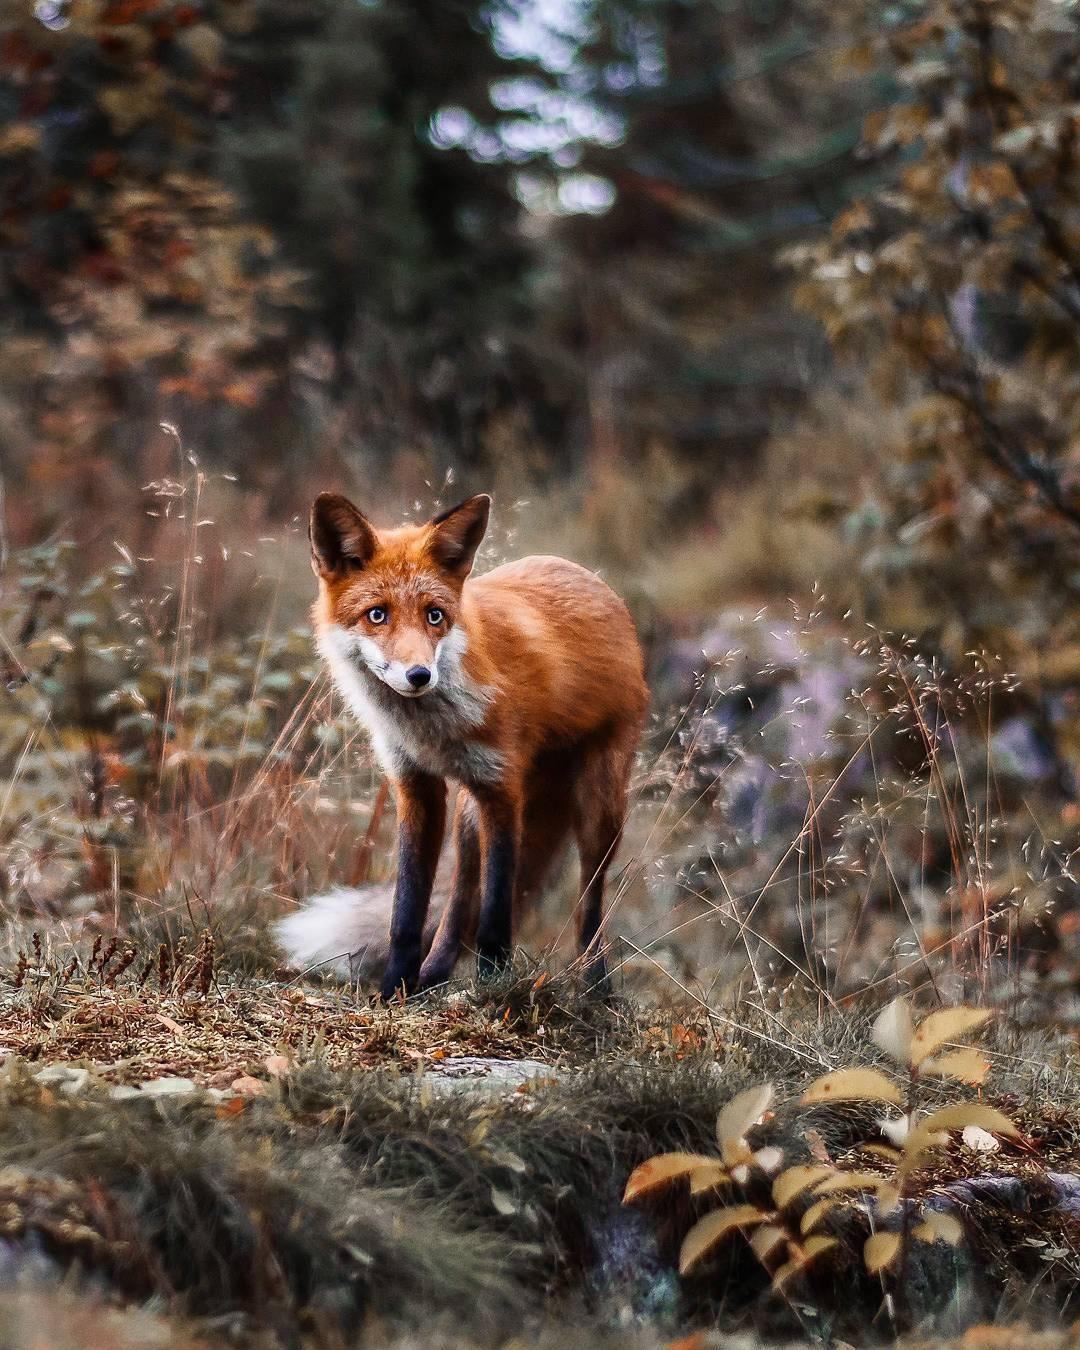 Photos Capture Finland's Fairytale Forest Animals In The Wild